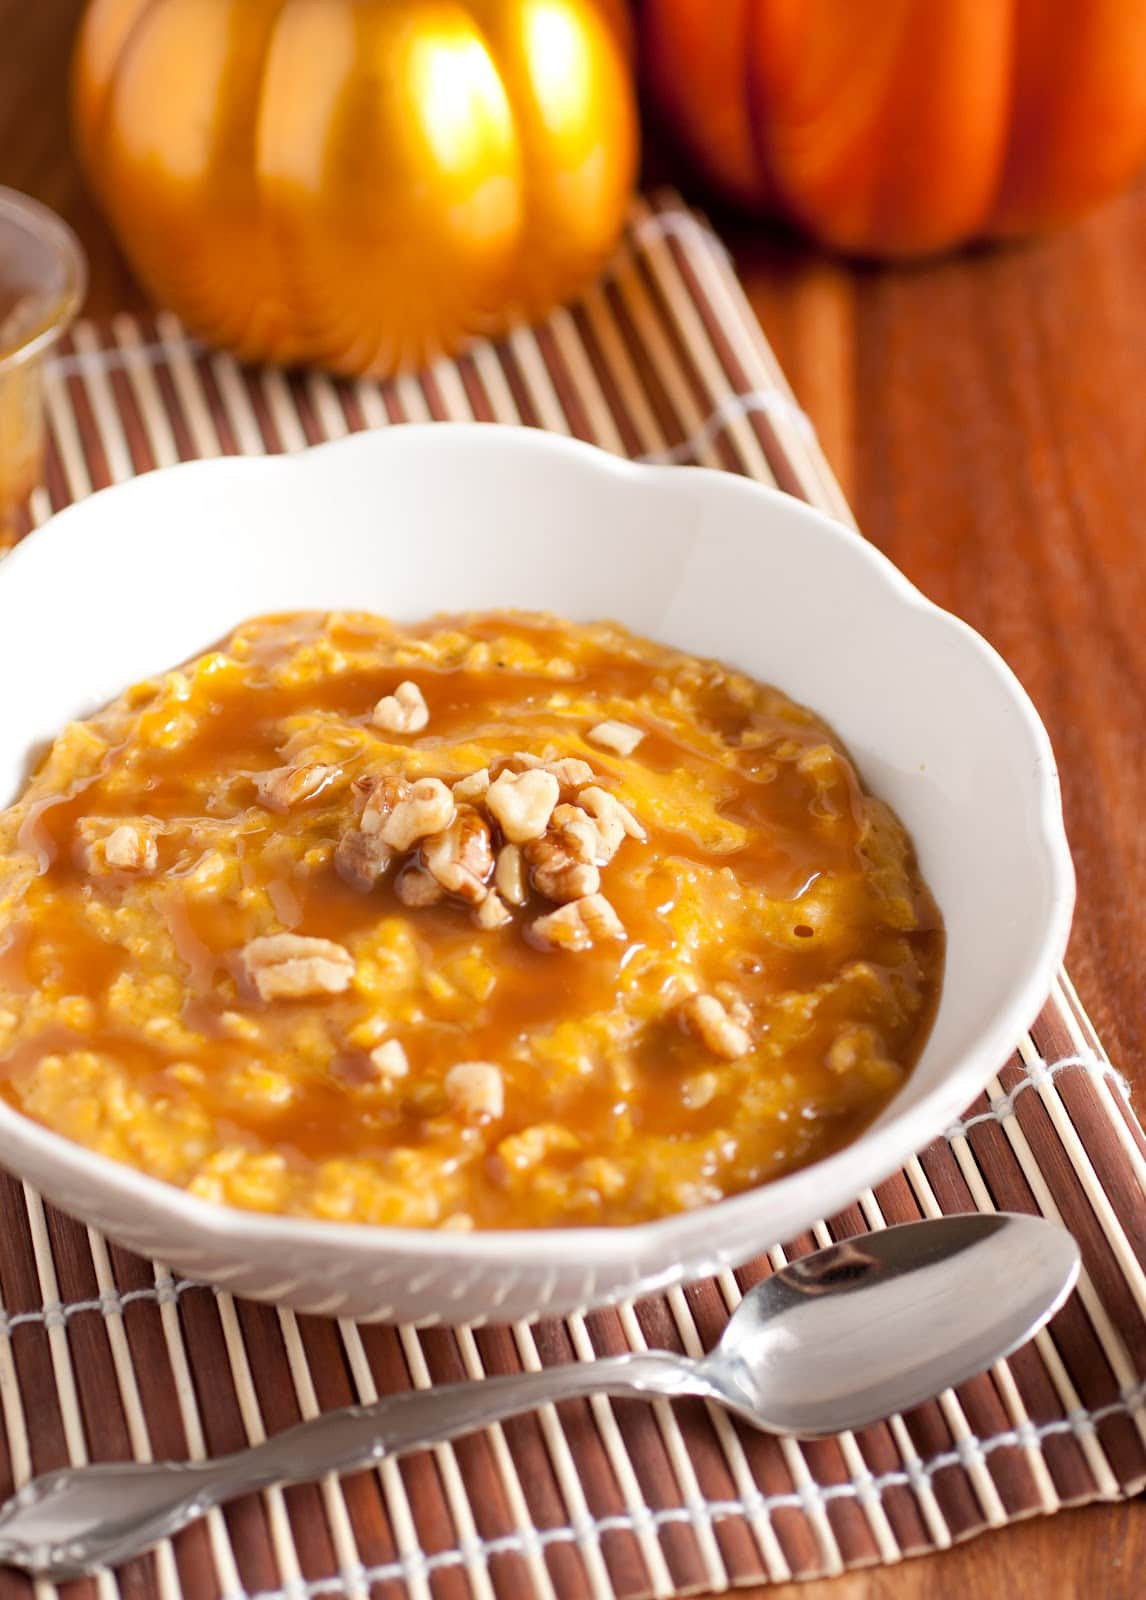 Pumpkin Breakfast Recipes  munity Post 31 Pumpkin Recipes To Get You Ready For